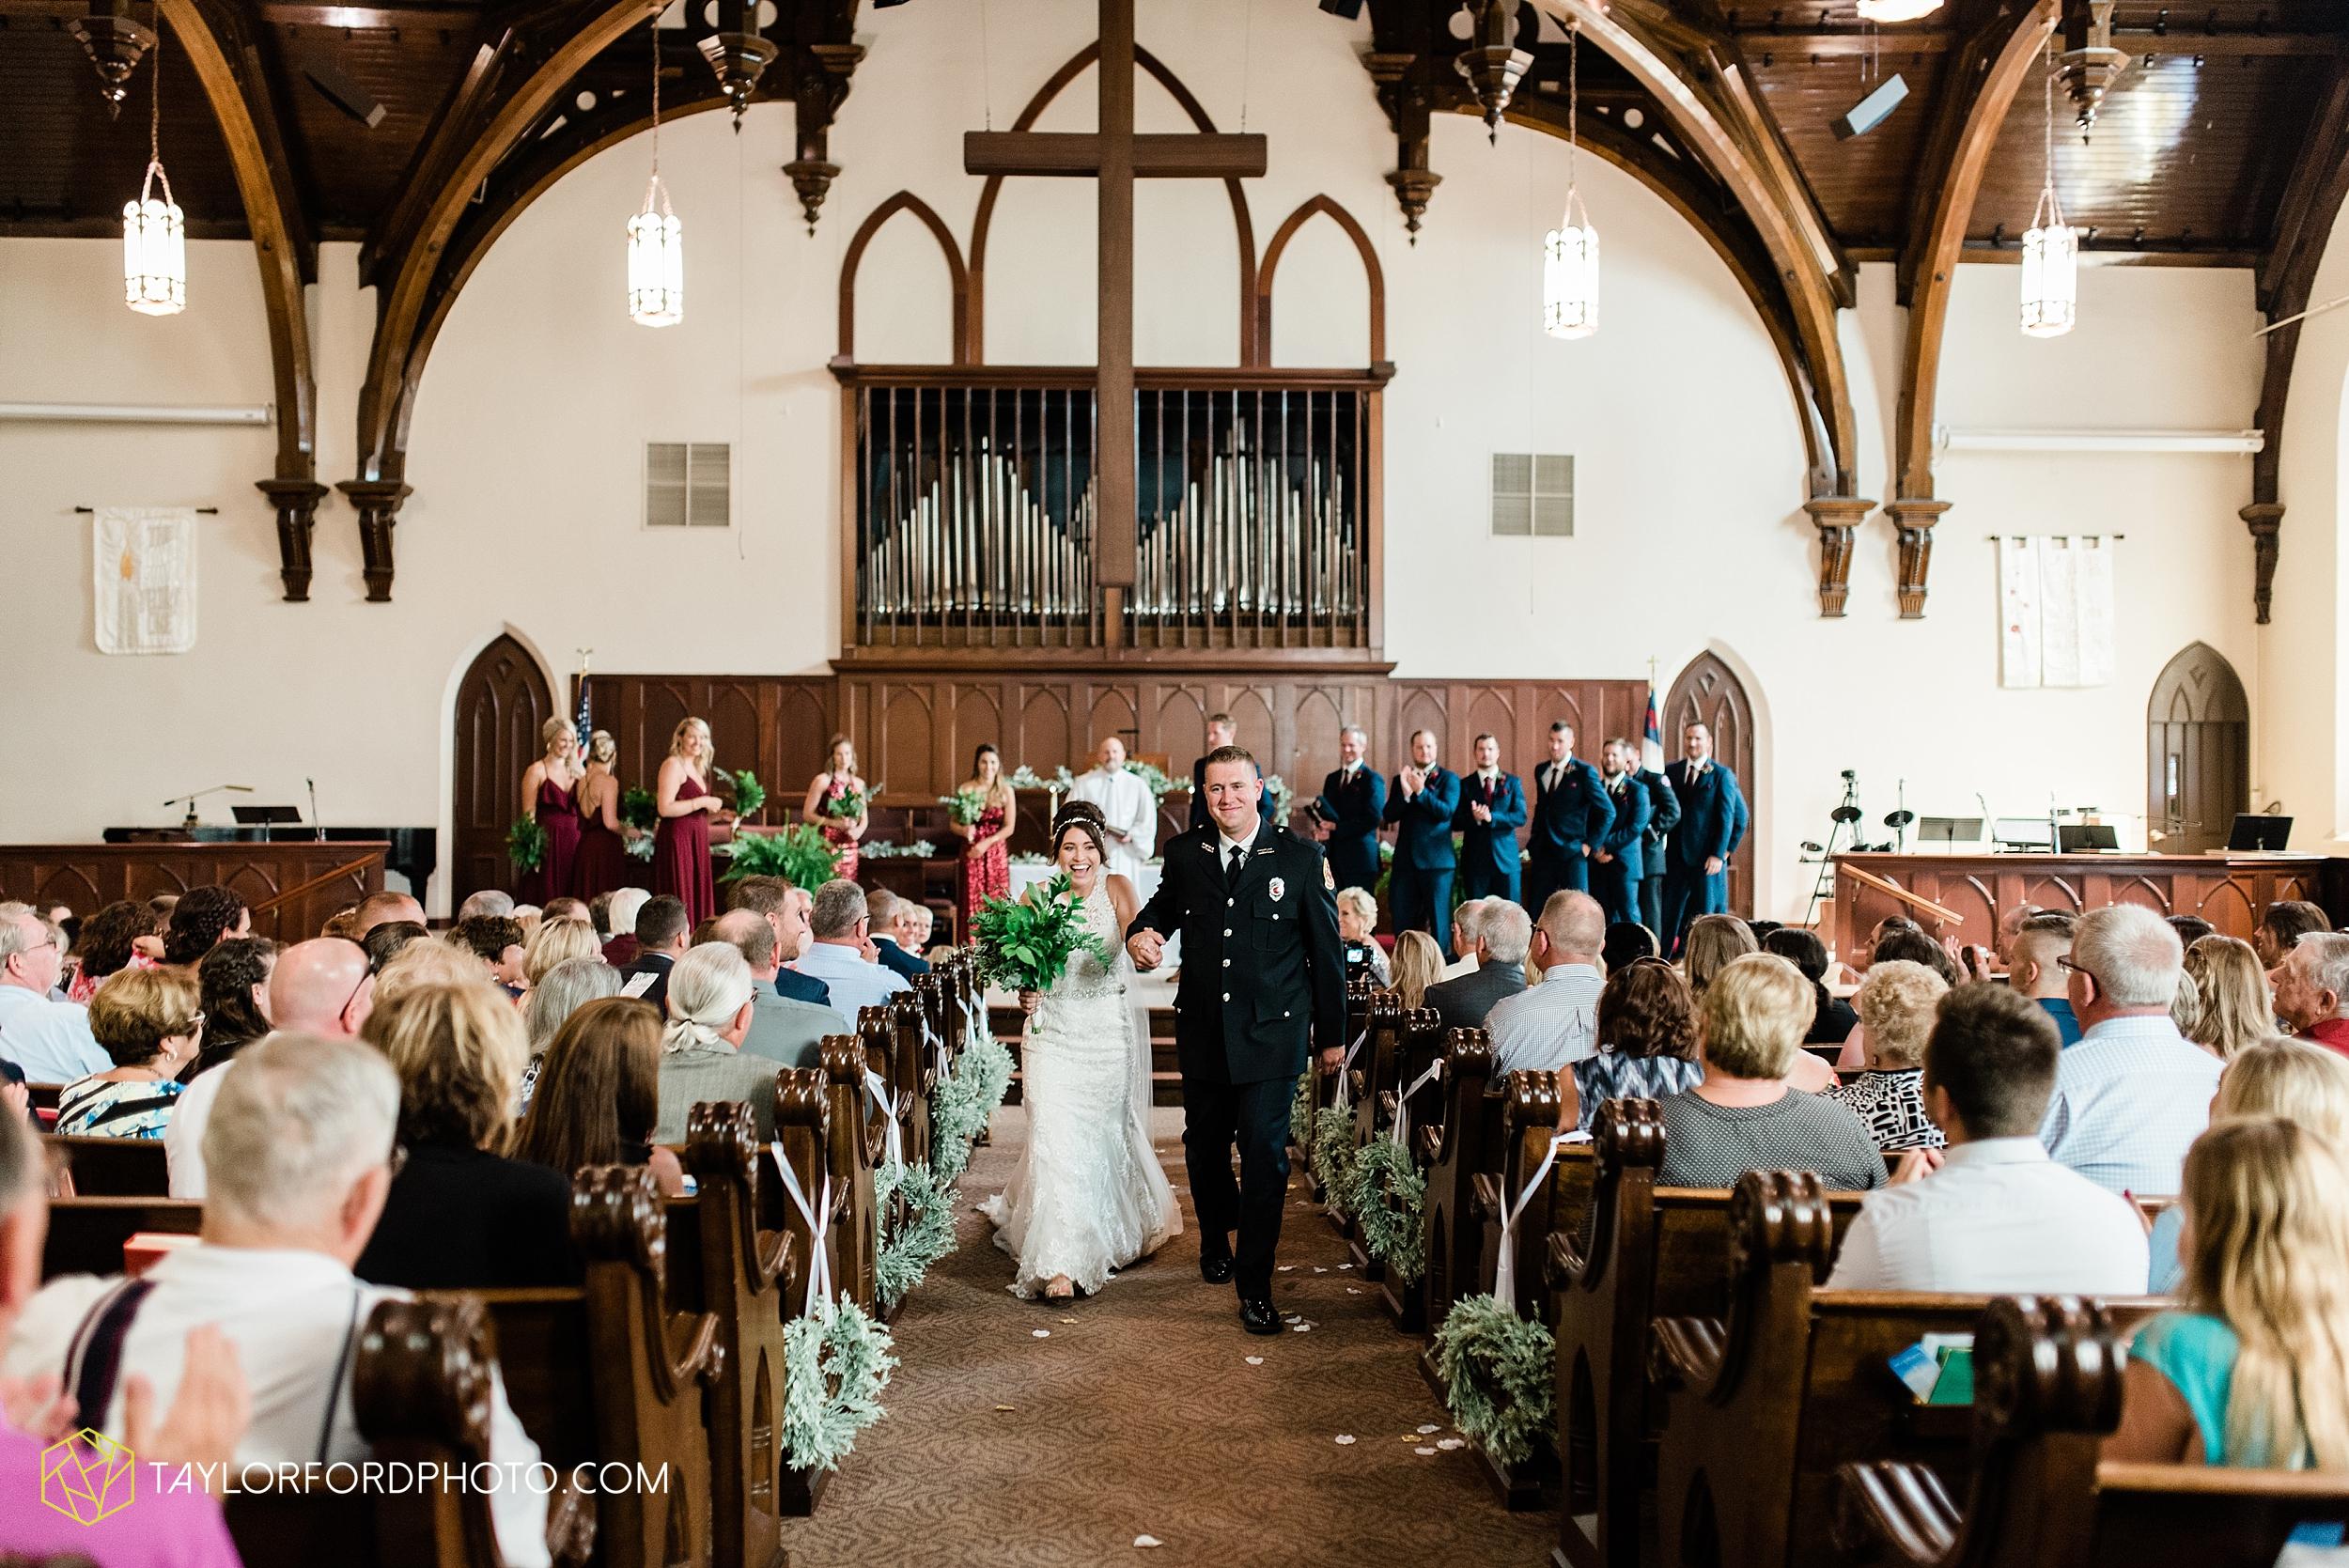 van-wert-ohio-first-united-methodist-church-county-dairy-barn-wedding-photographer-taylor-ford-photography_9836.jpg